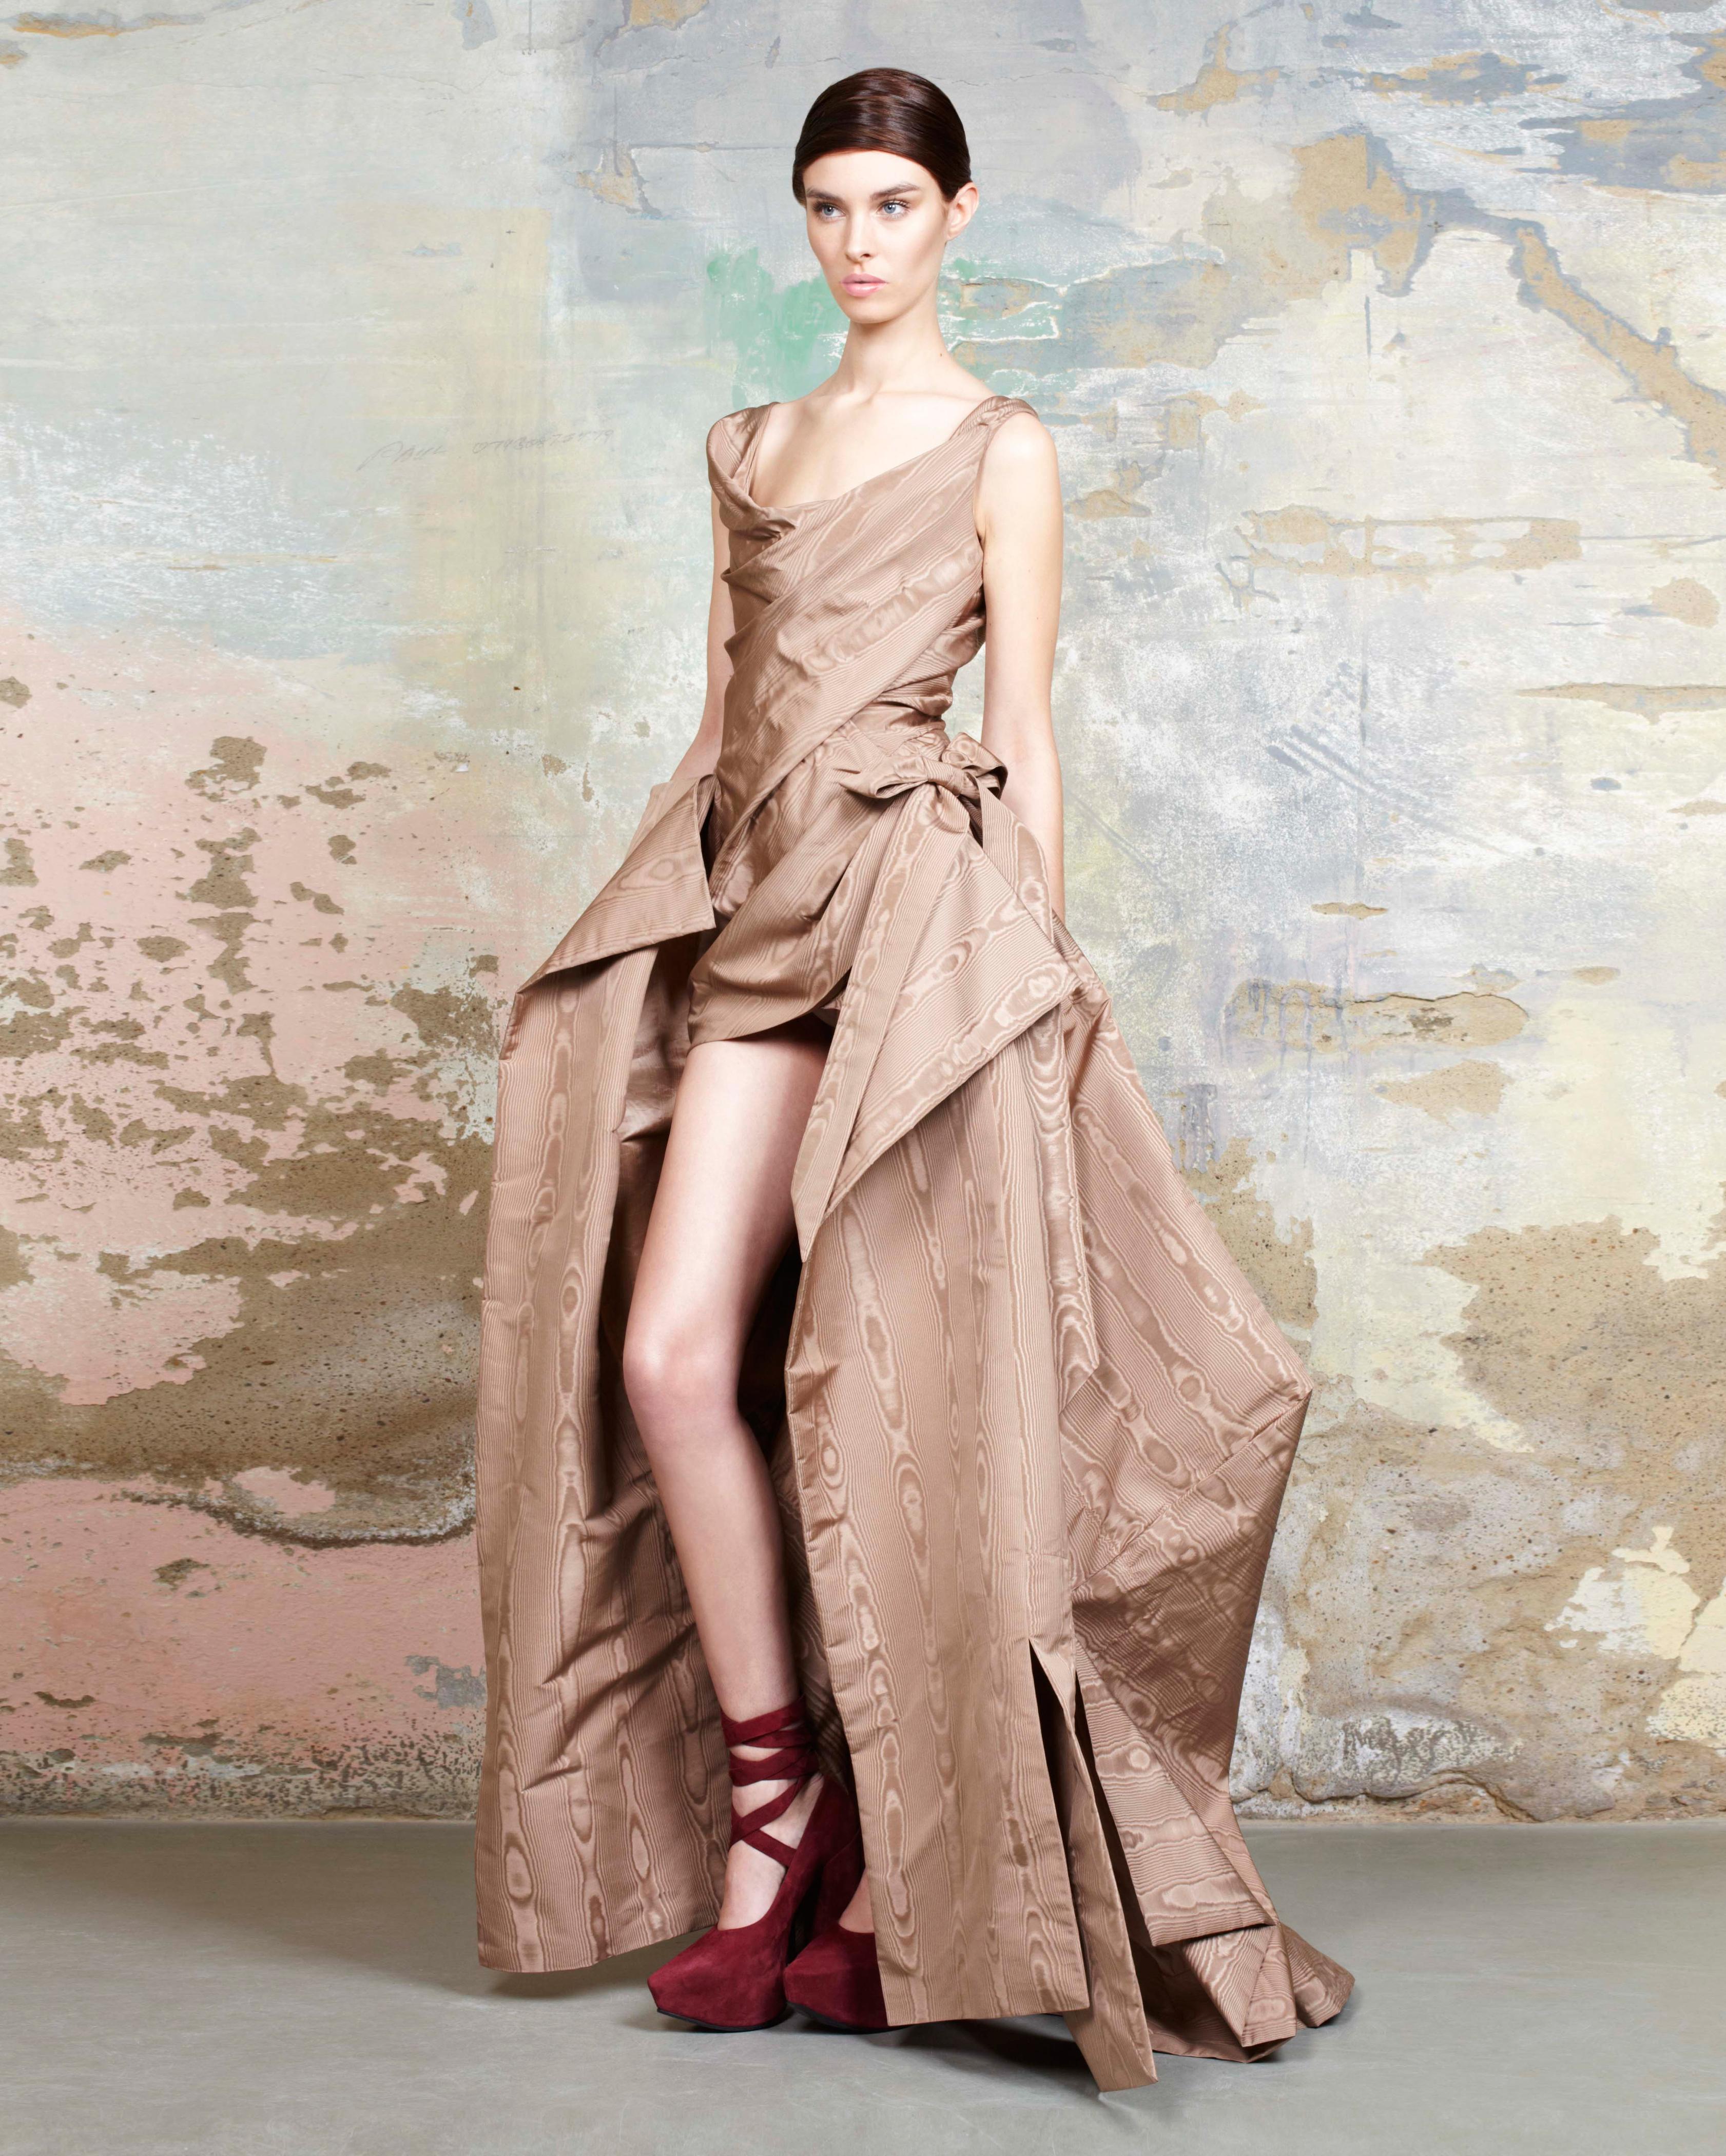 robert-pattinson-fka-twigs-wedding-dress-vivienne-westwood-marry-me-martha-0515.jpg